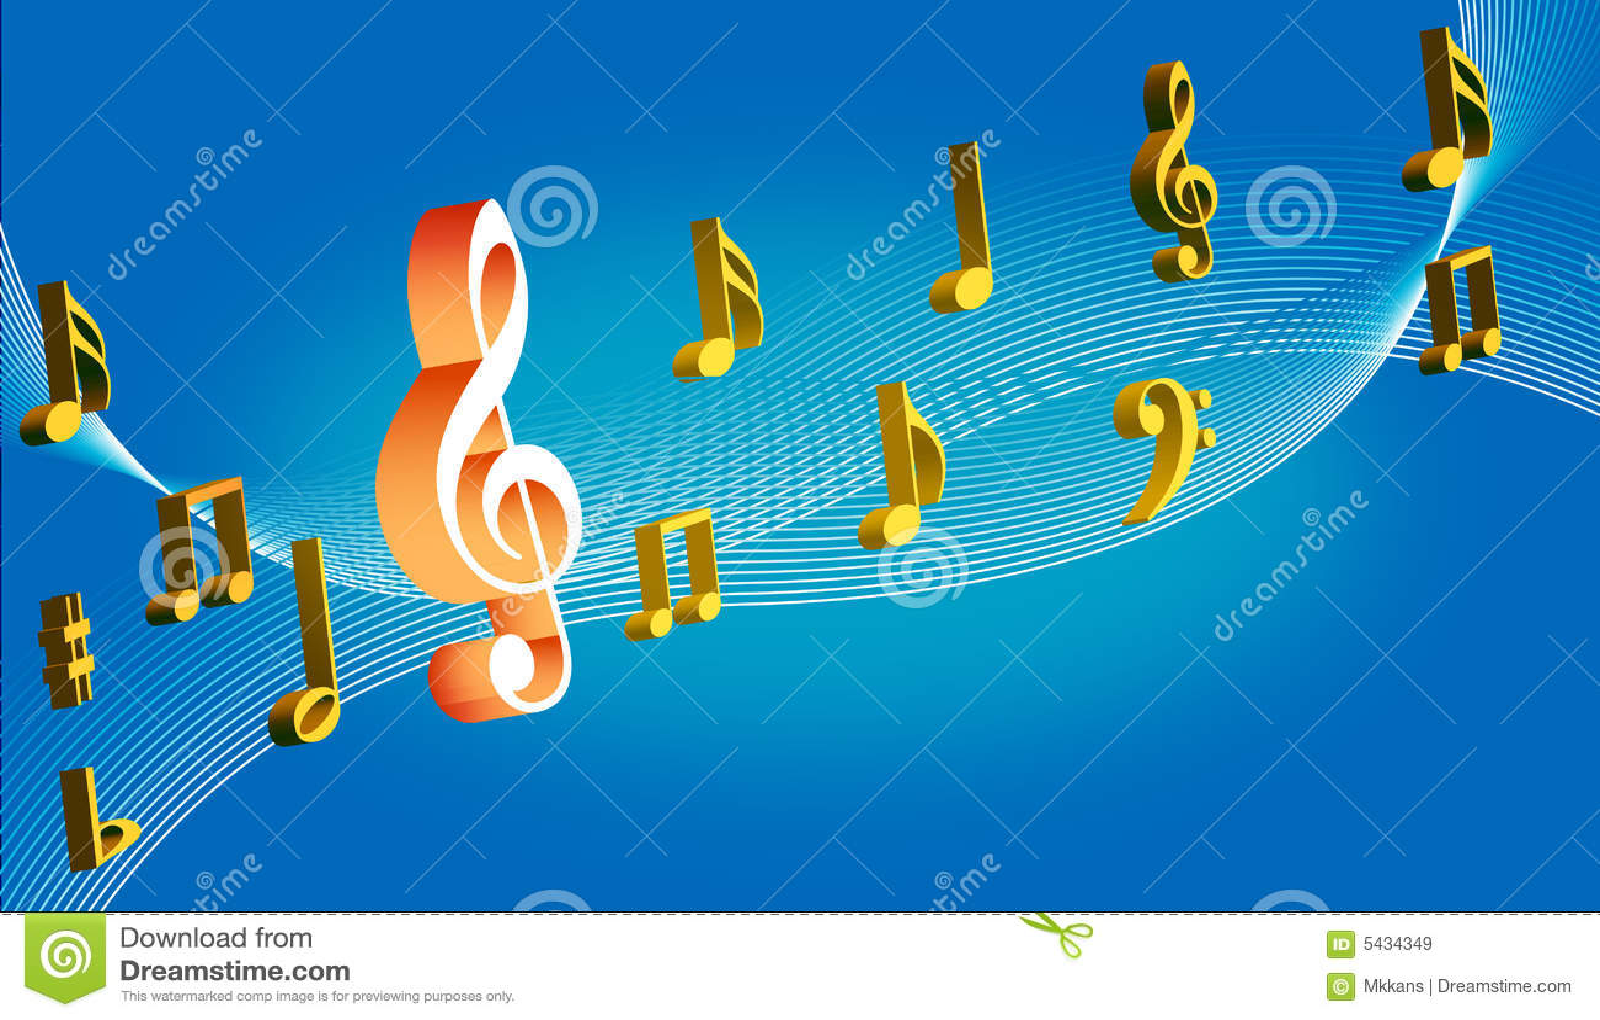 Muzyka kwiecista